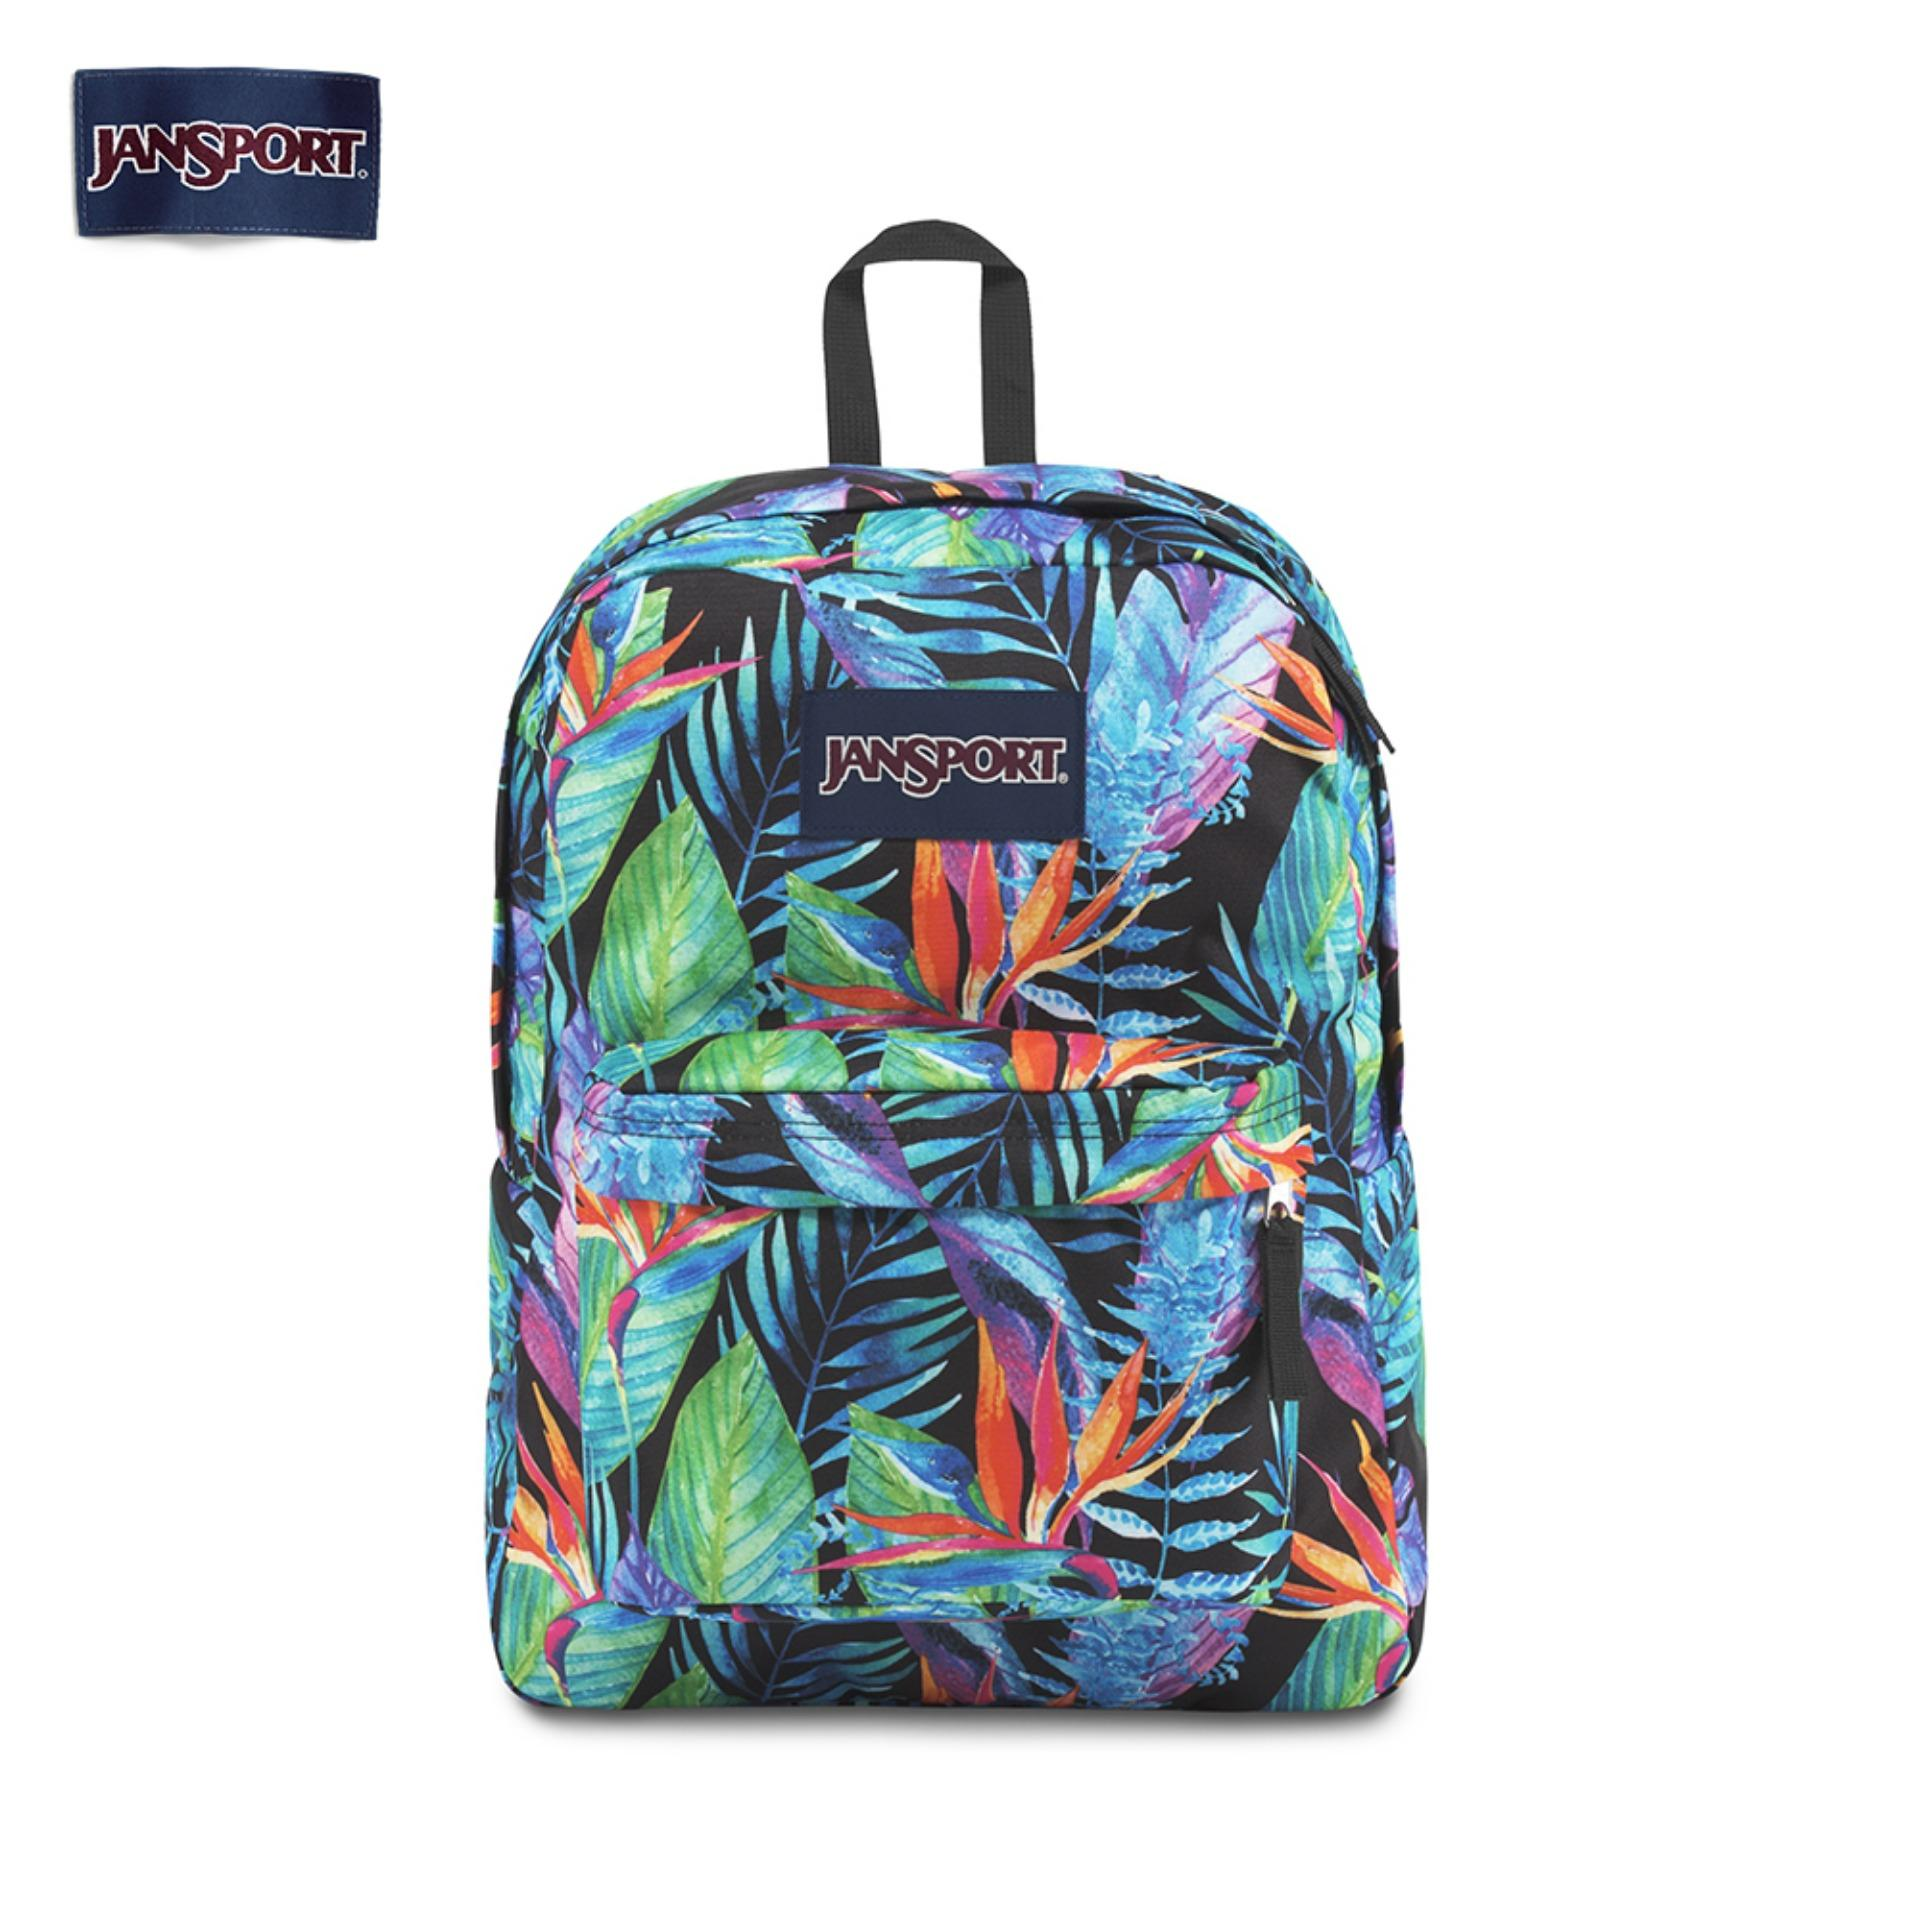 f678ab562 JanSport Philippines: JanSport price list - JanSport Bags ...